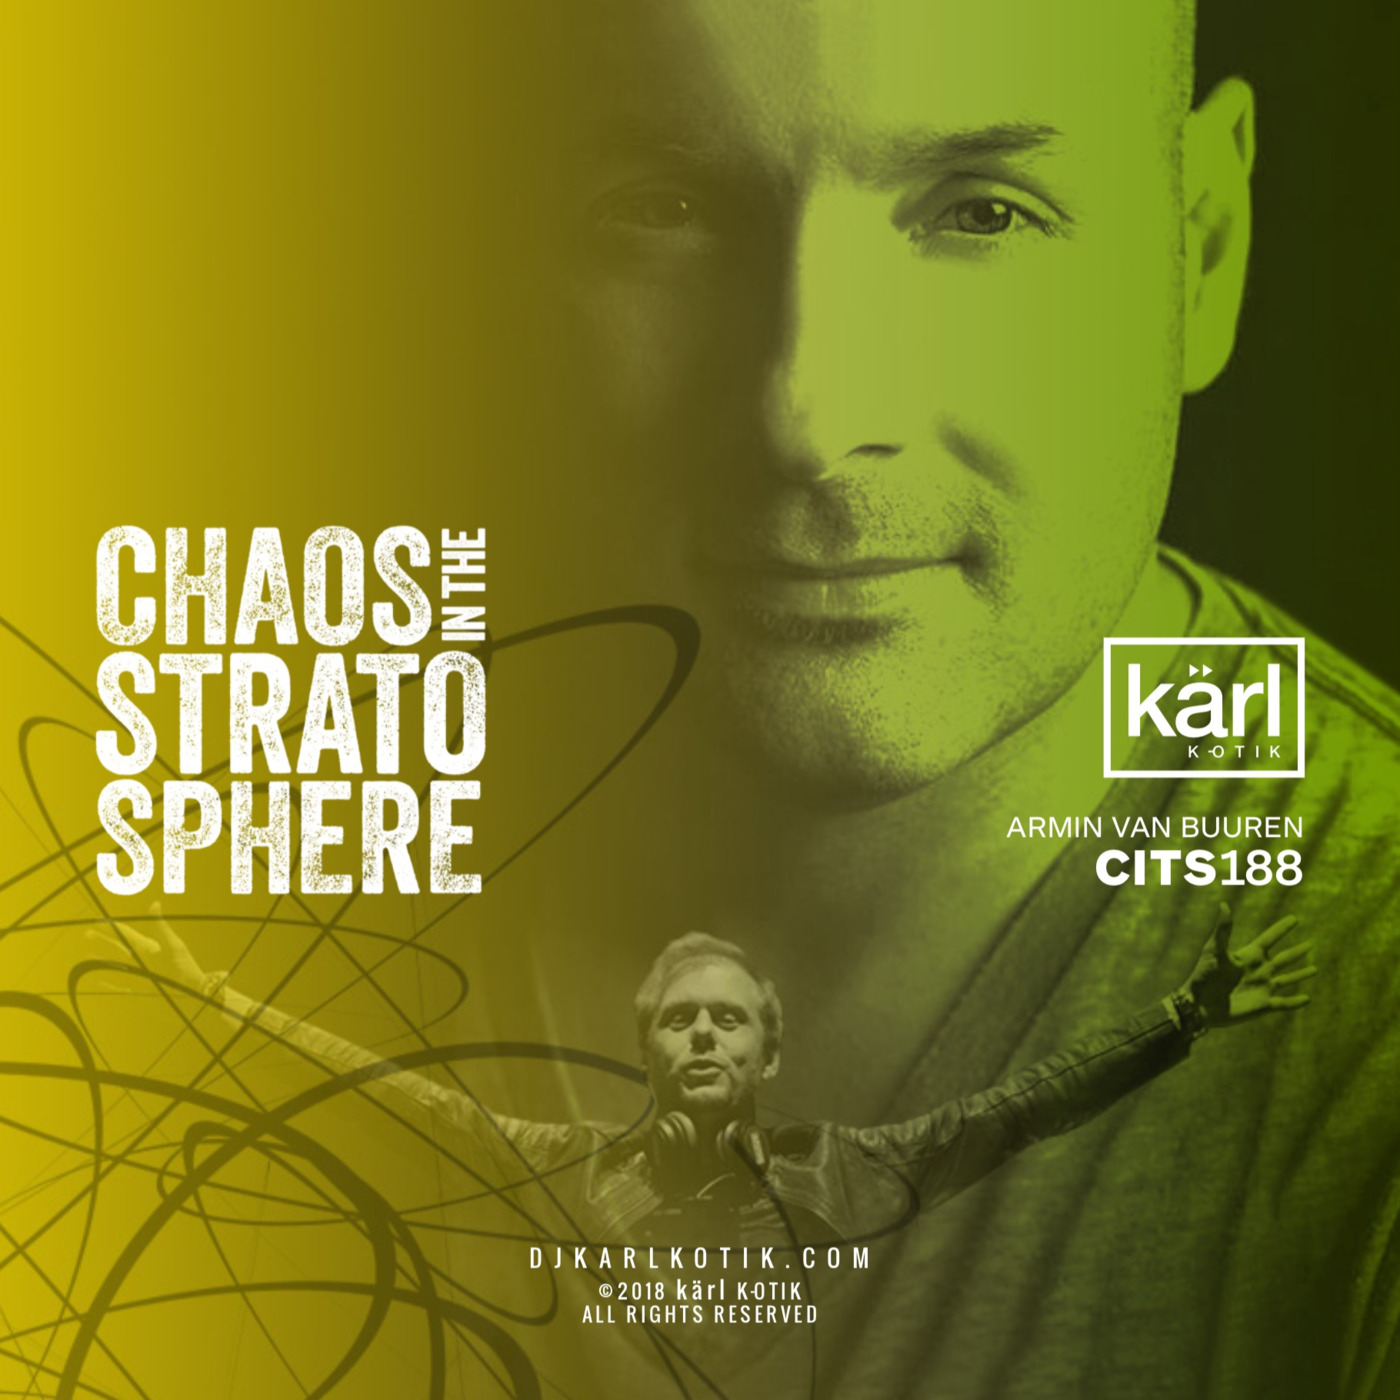 Dj Karl K-otik - Chaos In The Stratosphere Episode 188